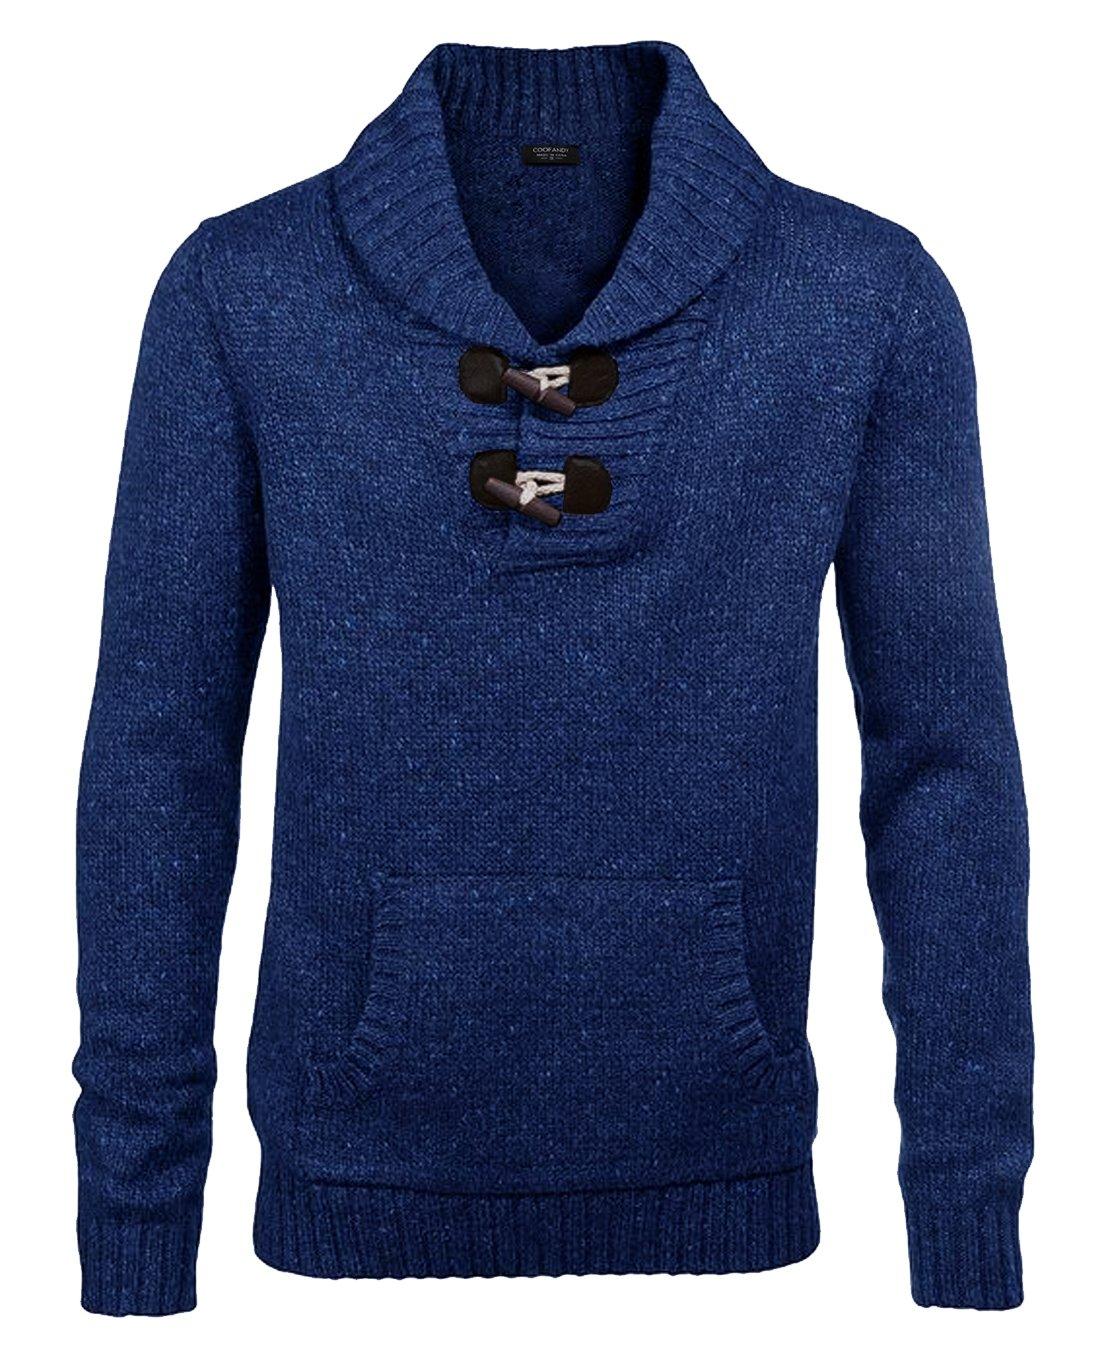 COOFANDY Men's Fashion Long Sleeve Plaid Button Down Casual Shirts, Blue XL